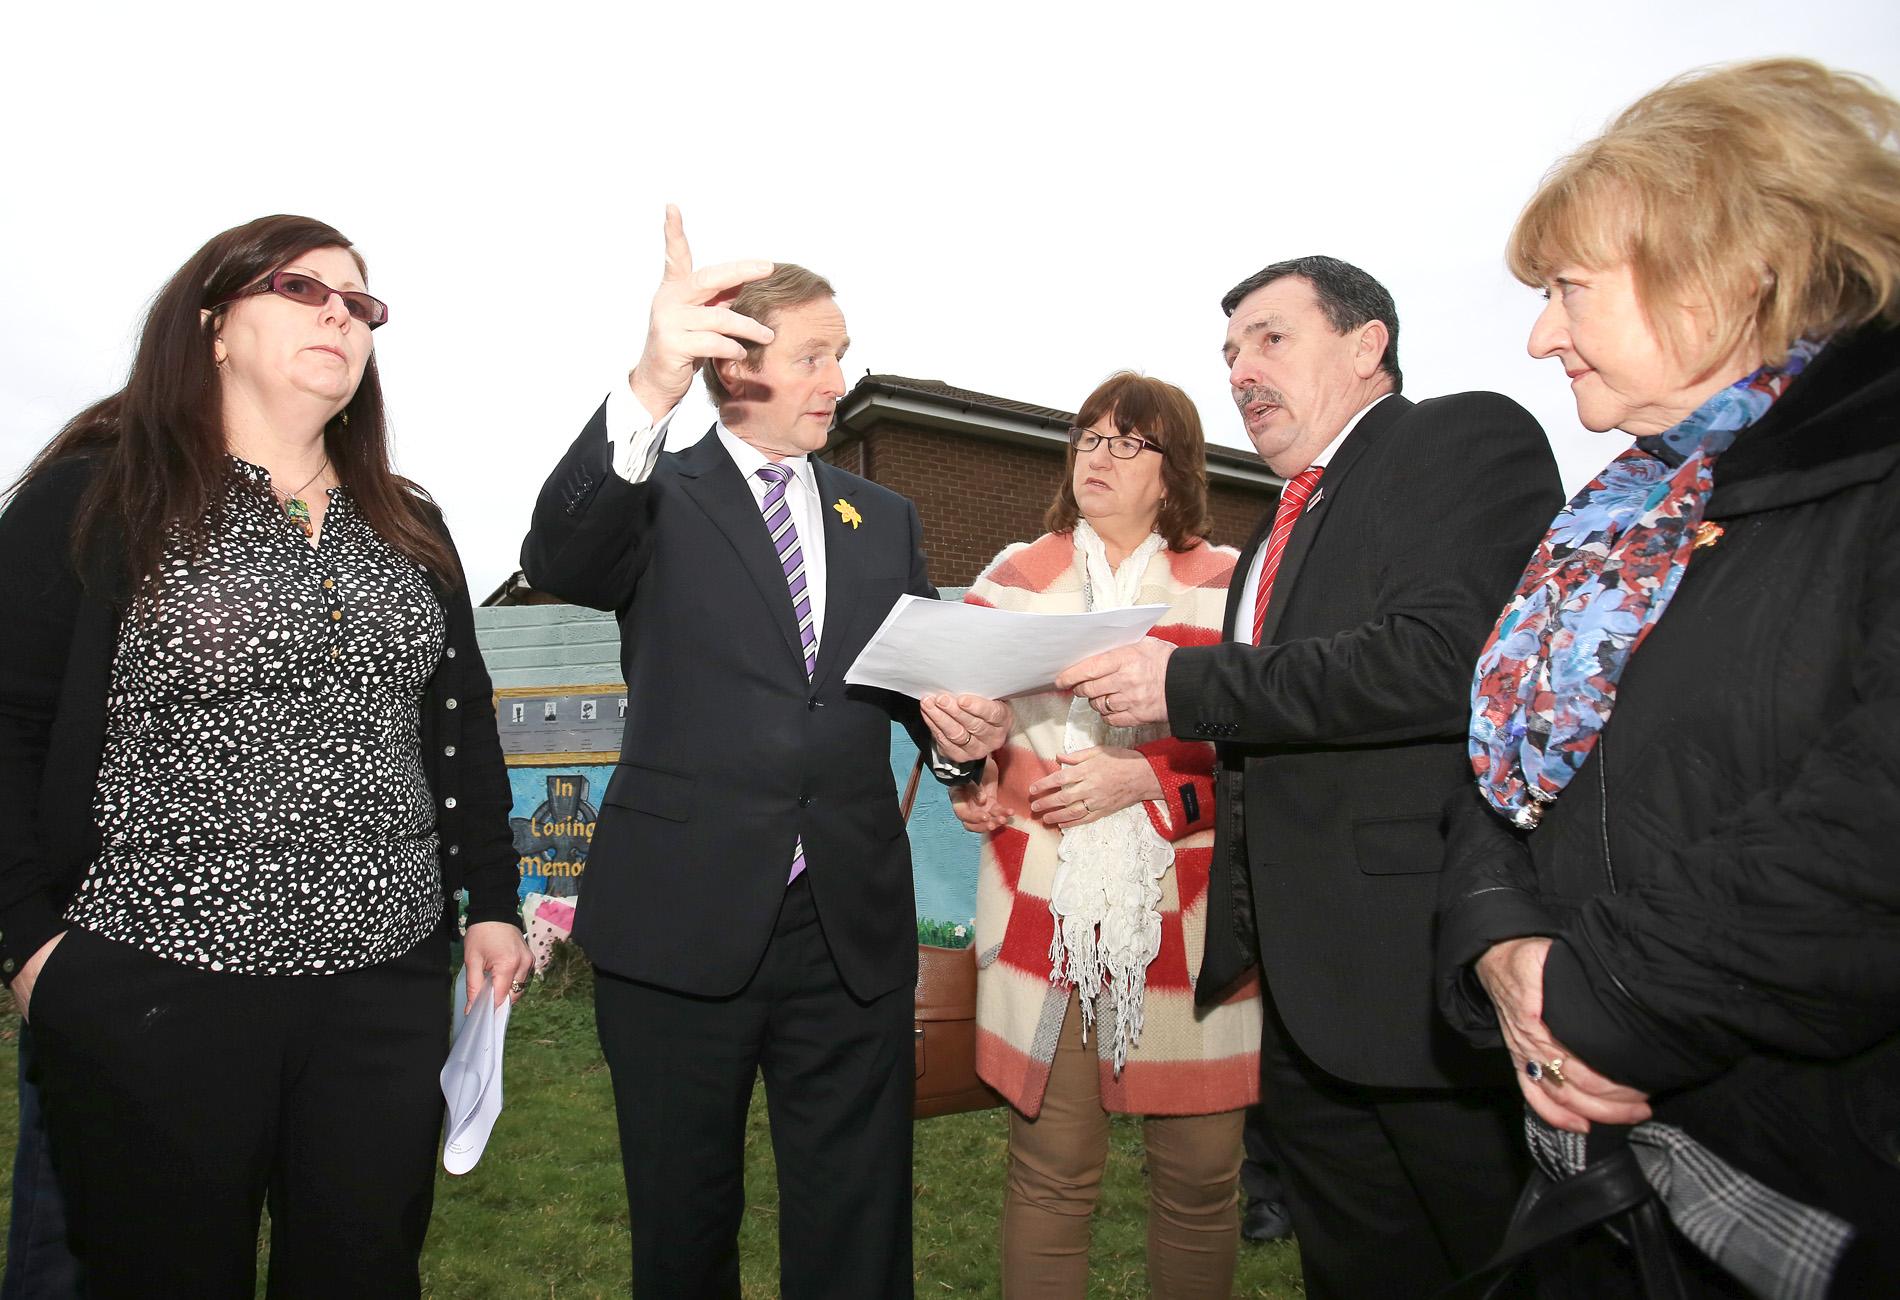 Taoiseach murph